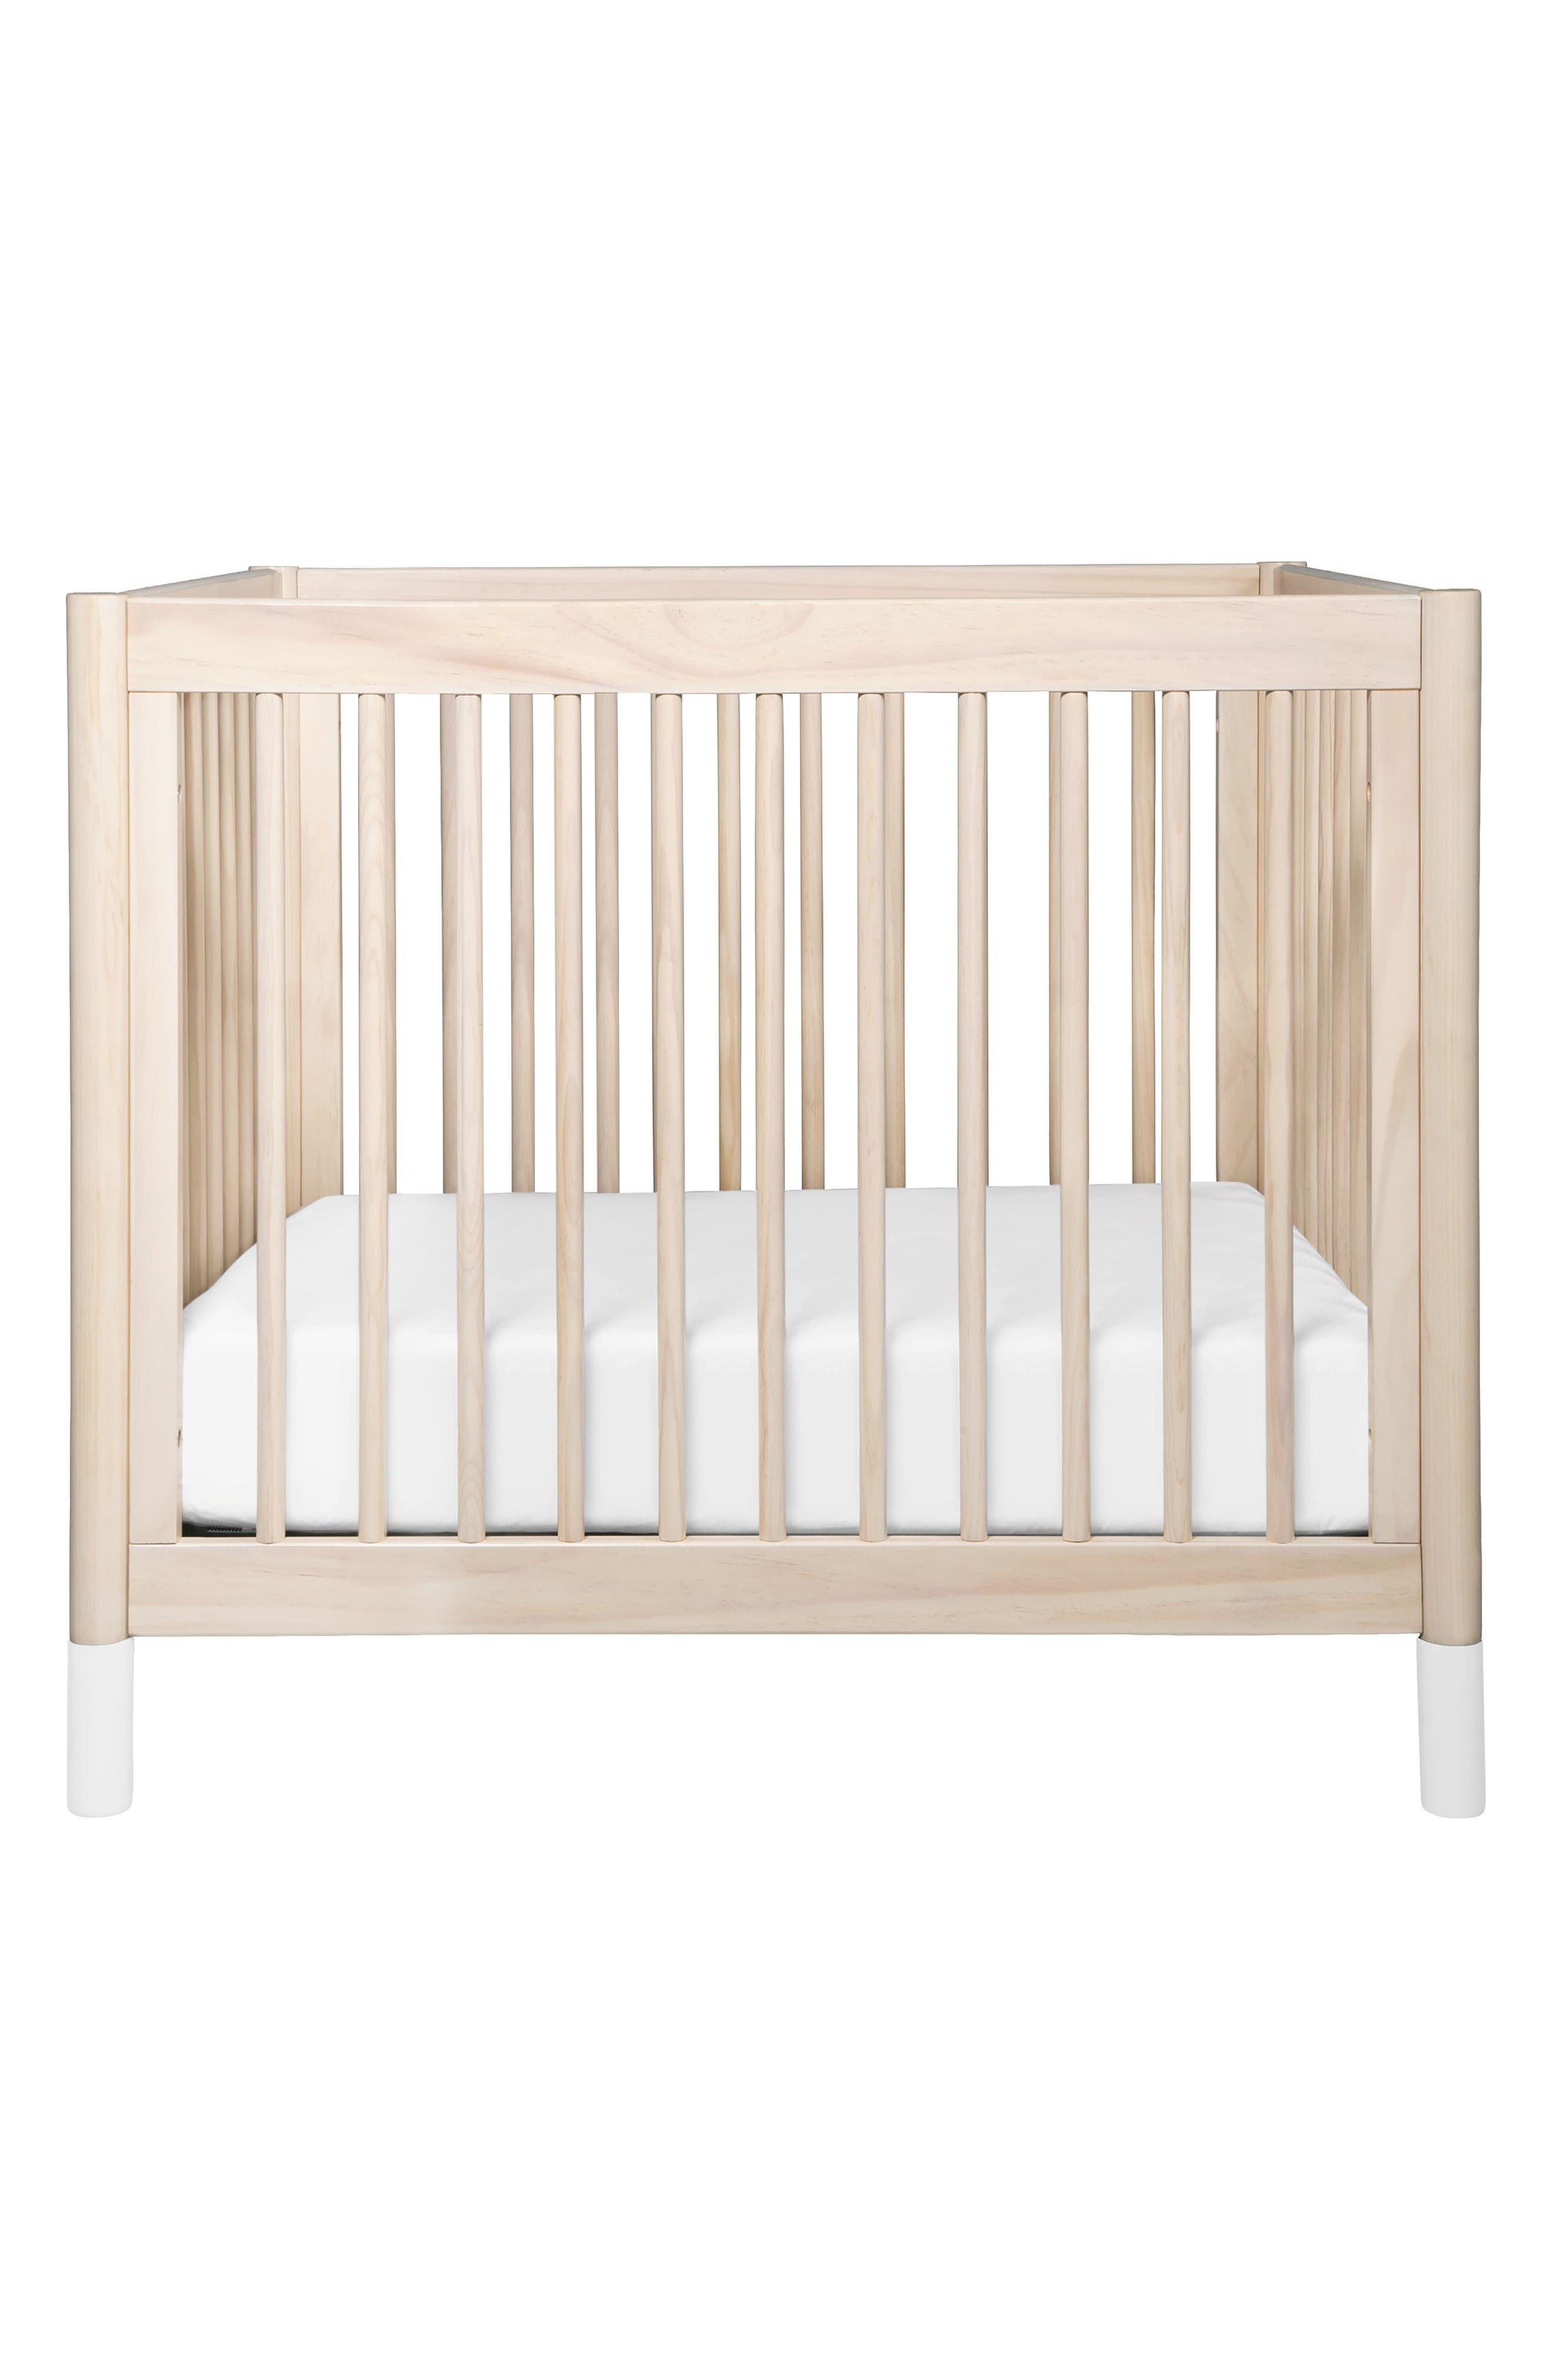 Gelato Mini Crib,                             Main thumbnail 1, color,                             Washed Natural And White